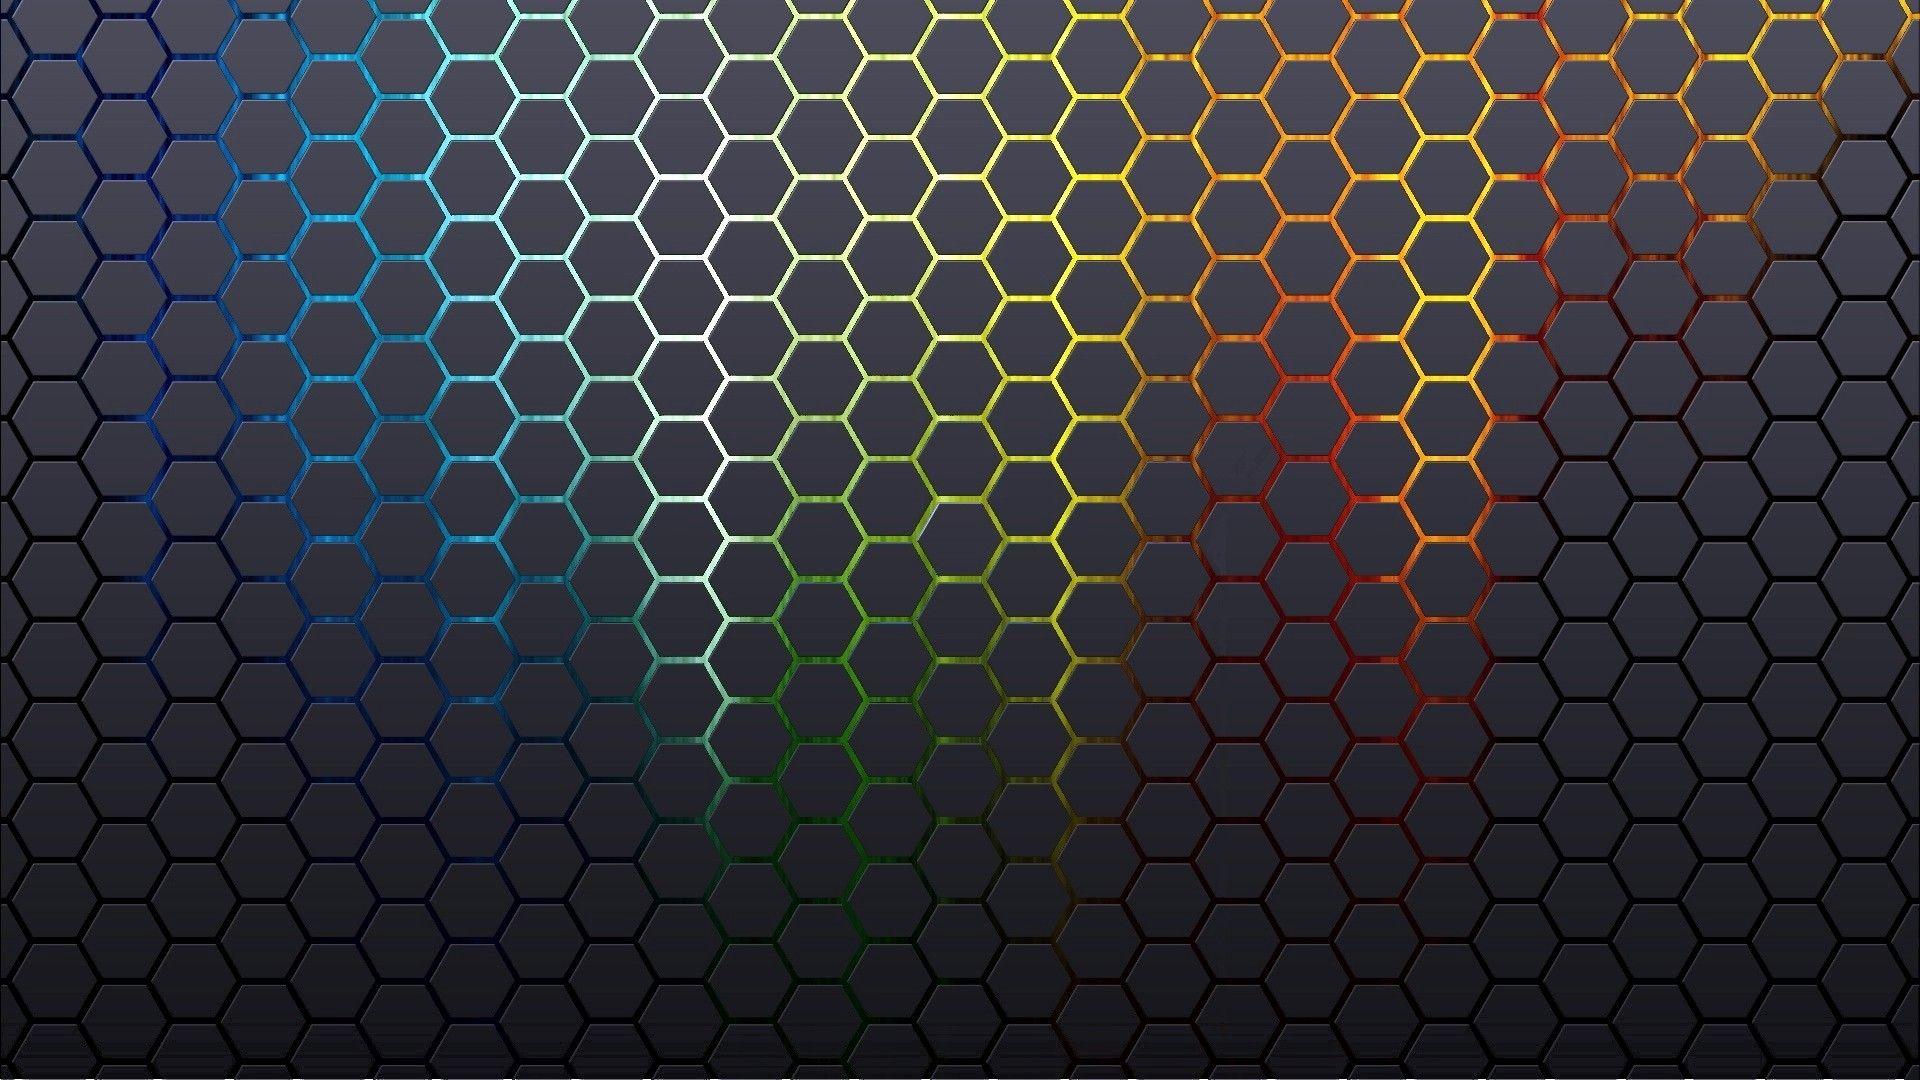 Texture Colorful Beehive Patterns Minimalism Wallpaper Hexagon Wallpaper Abstract Textured Wallpaper